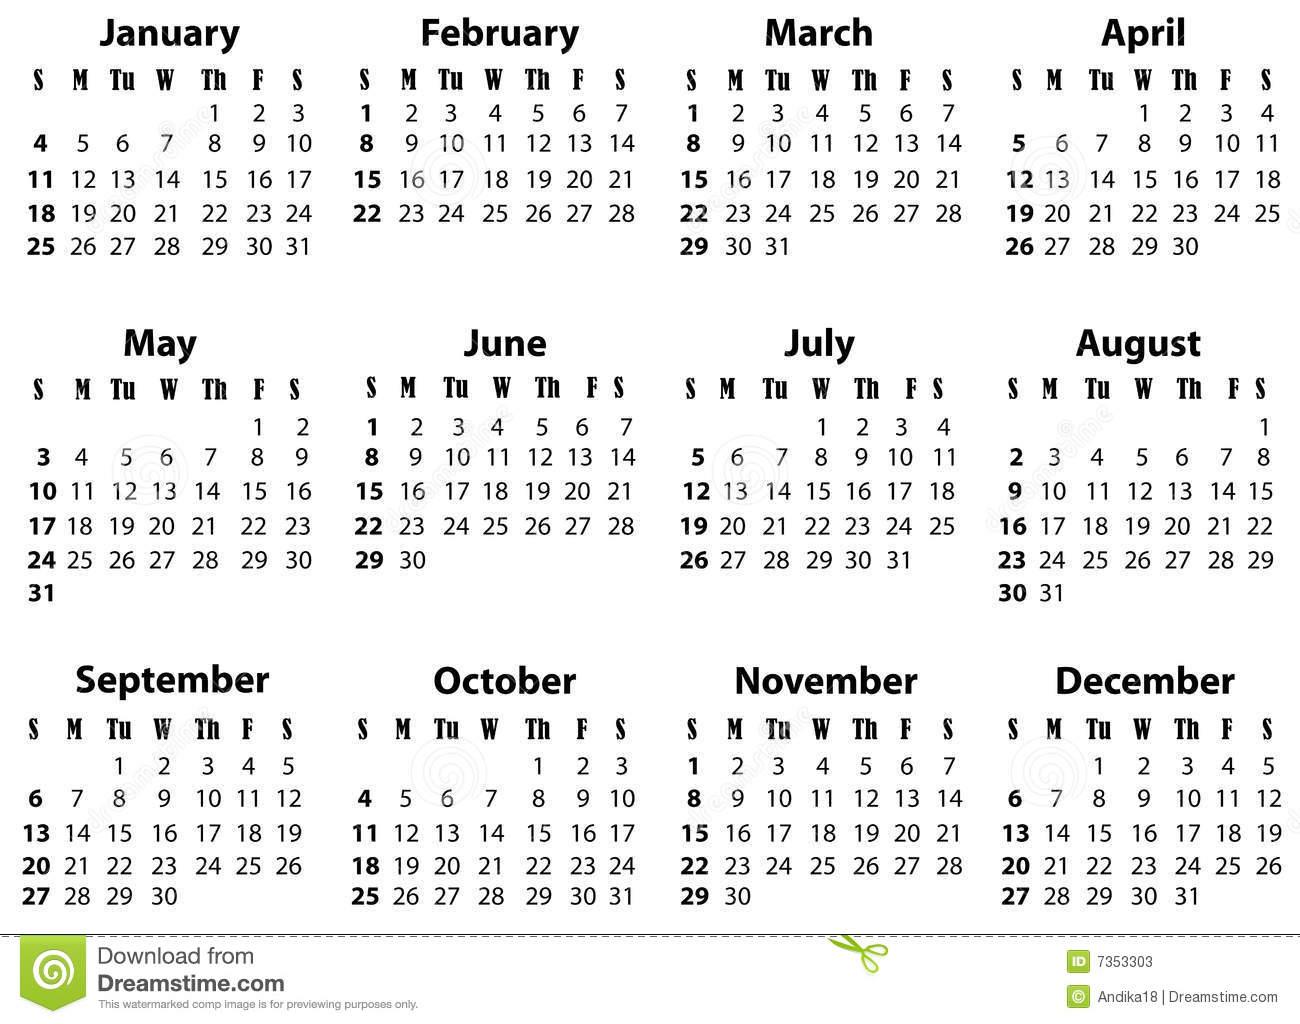 A Calendar For 2009 And 2020 Stock Photos Image: 7353303